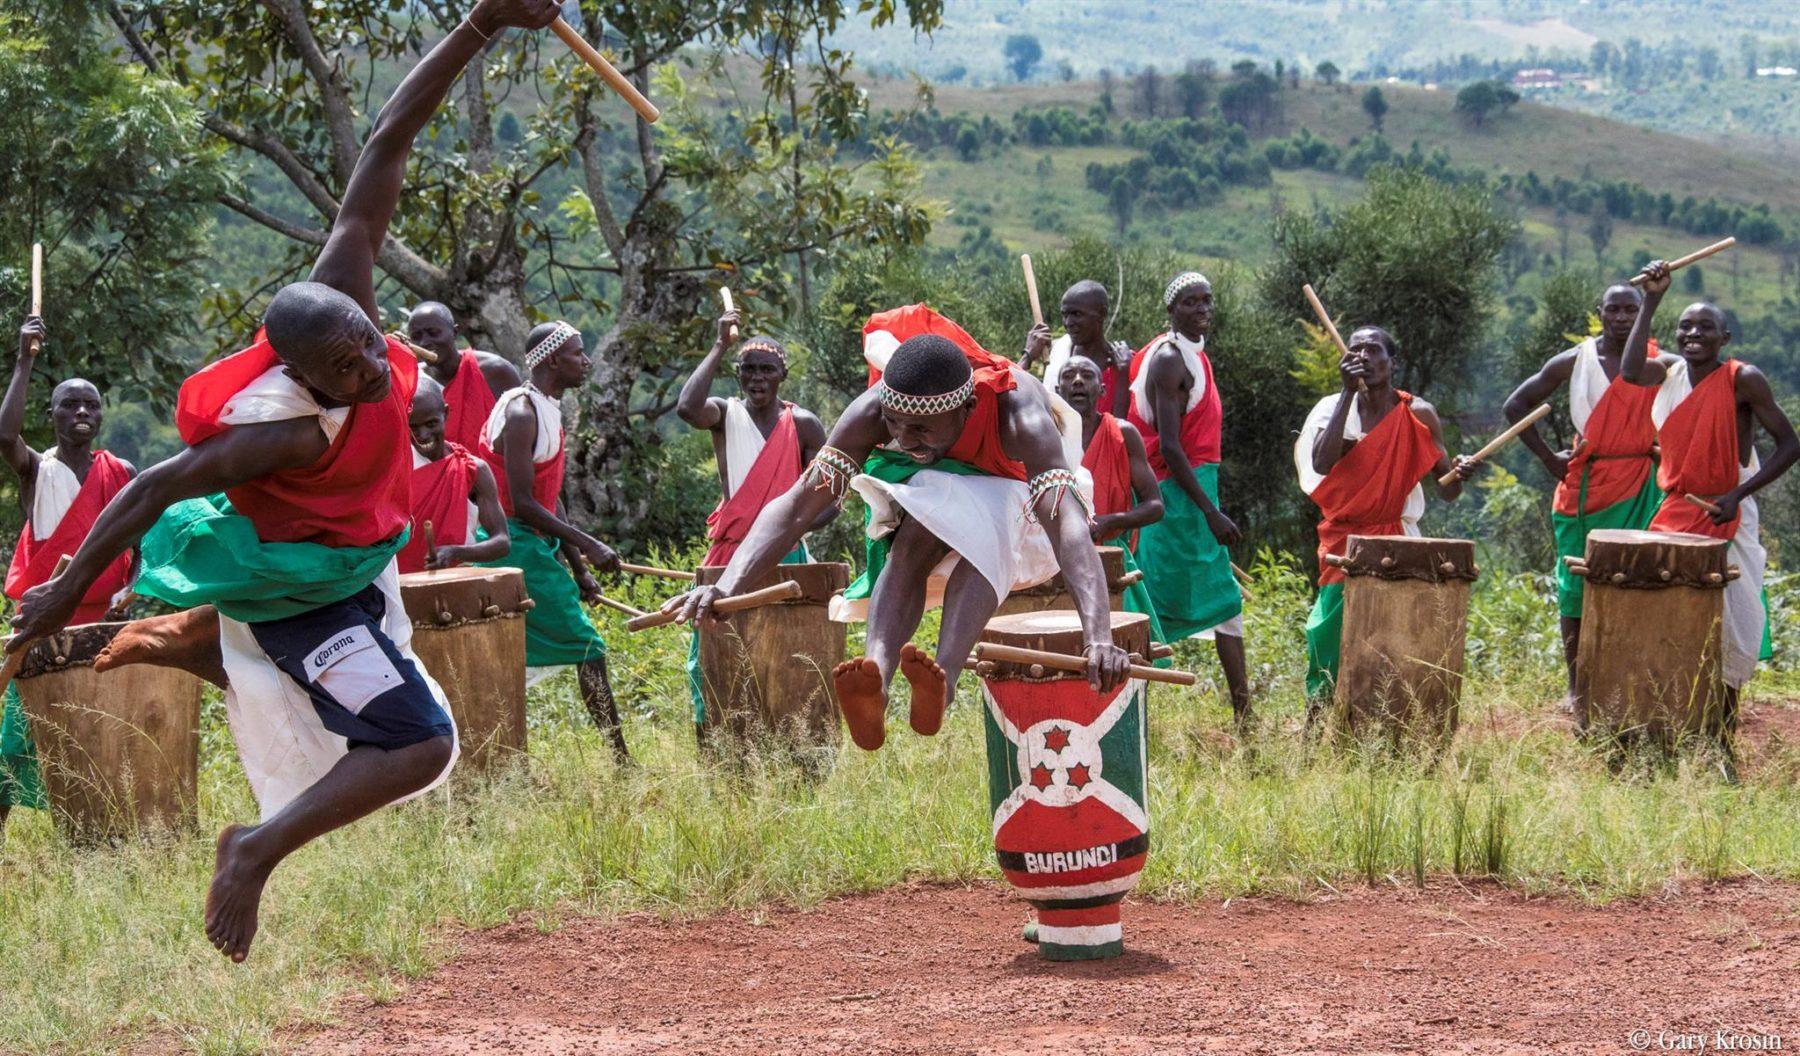 Burundi drummers-Augustine Tours.jpg